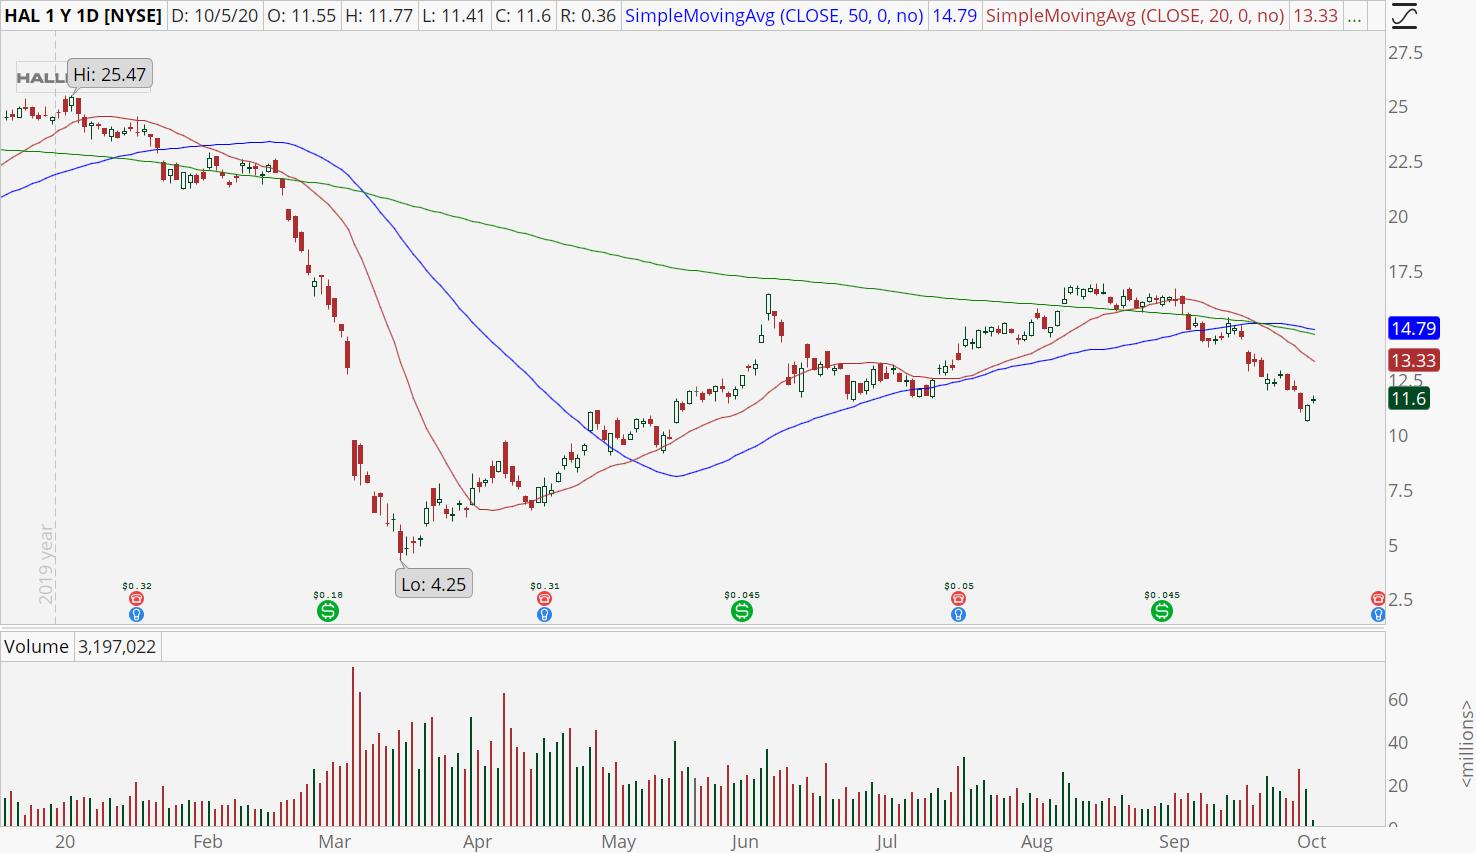 Halliburton (HAL) stock chart showing downtrend